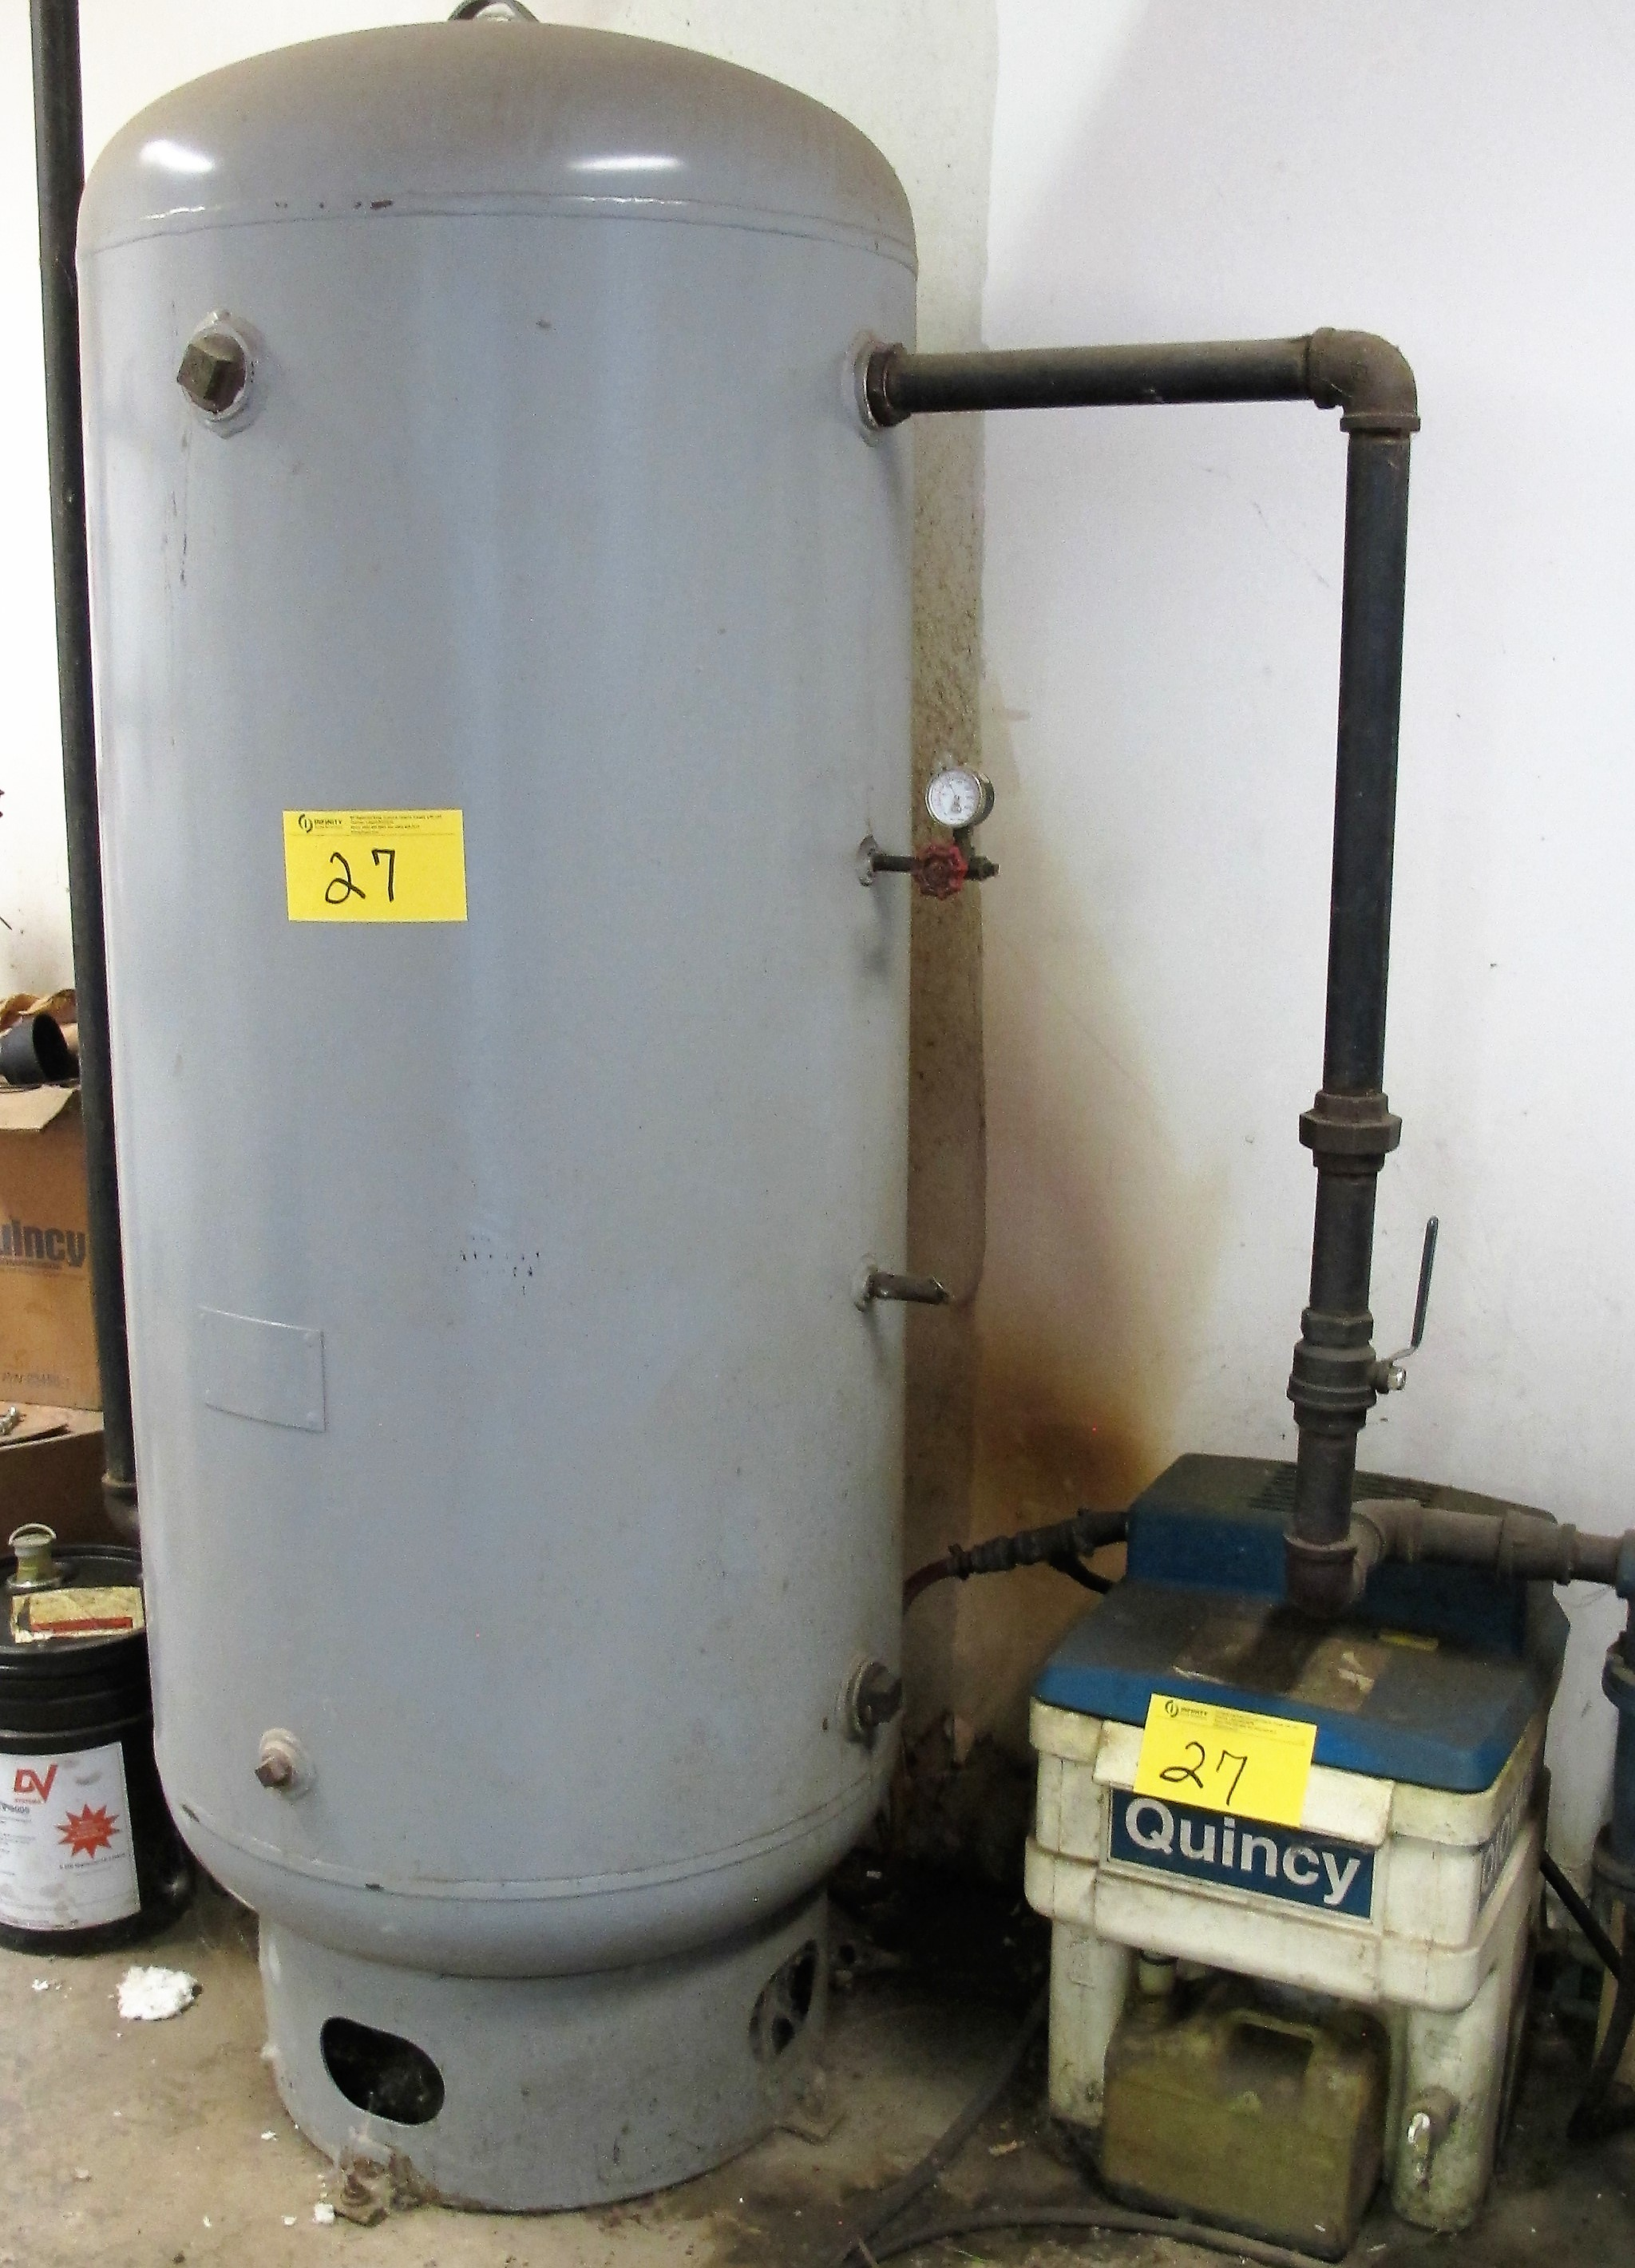 Lot 27 - QUINCY OIL/WATER SEPARATOR W/ AIR RECEIVING TANK